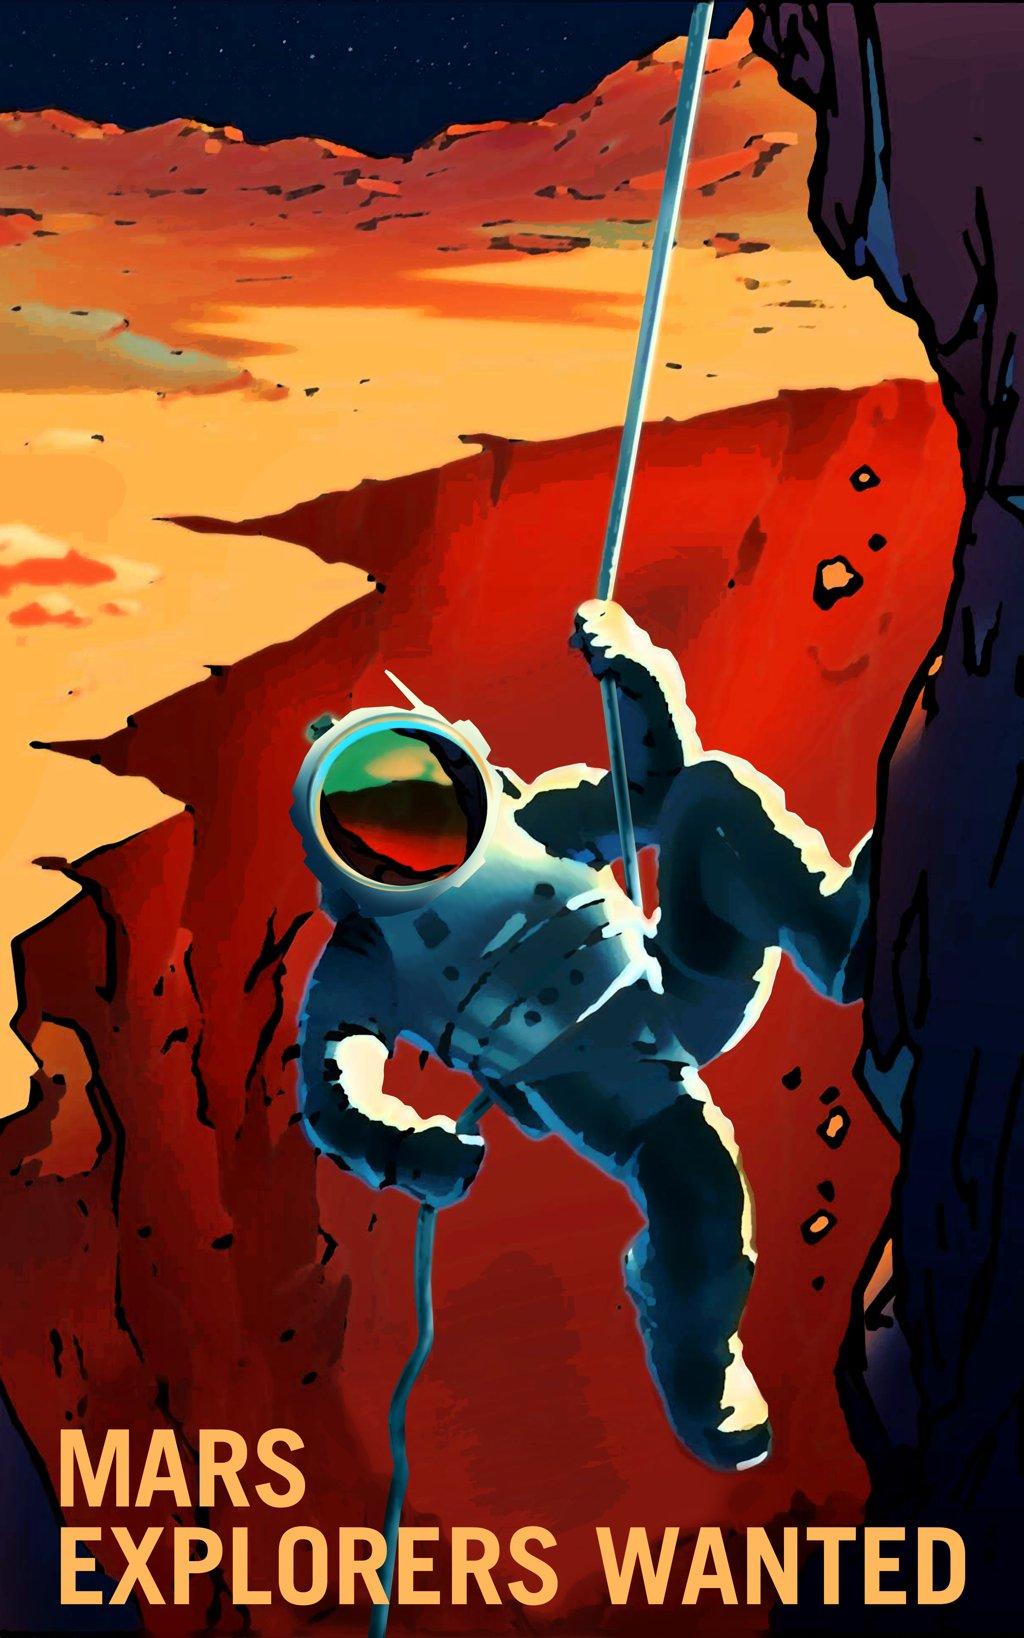 06142016-mars-explorers